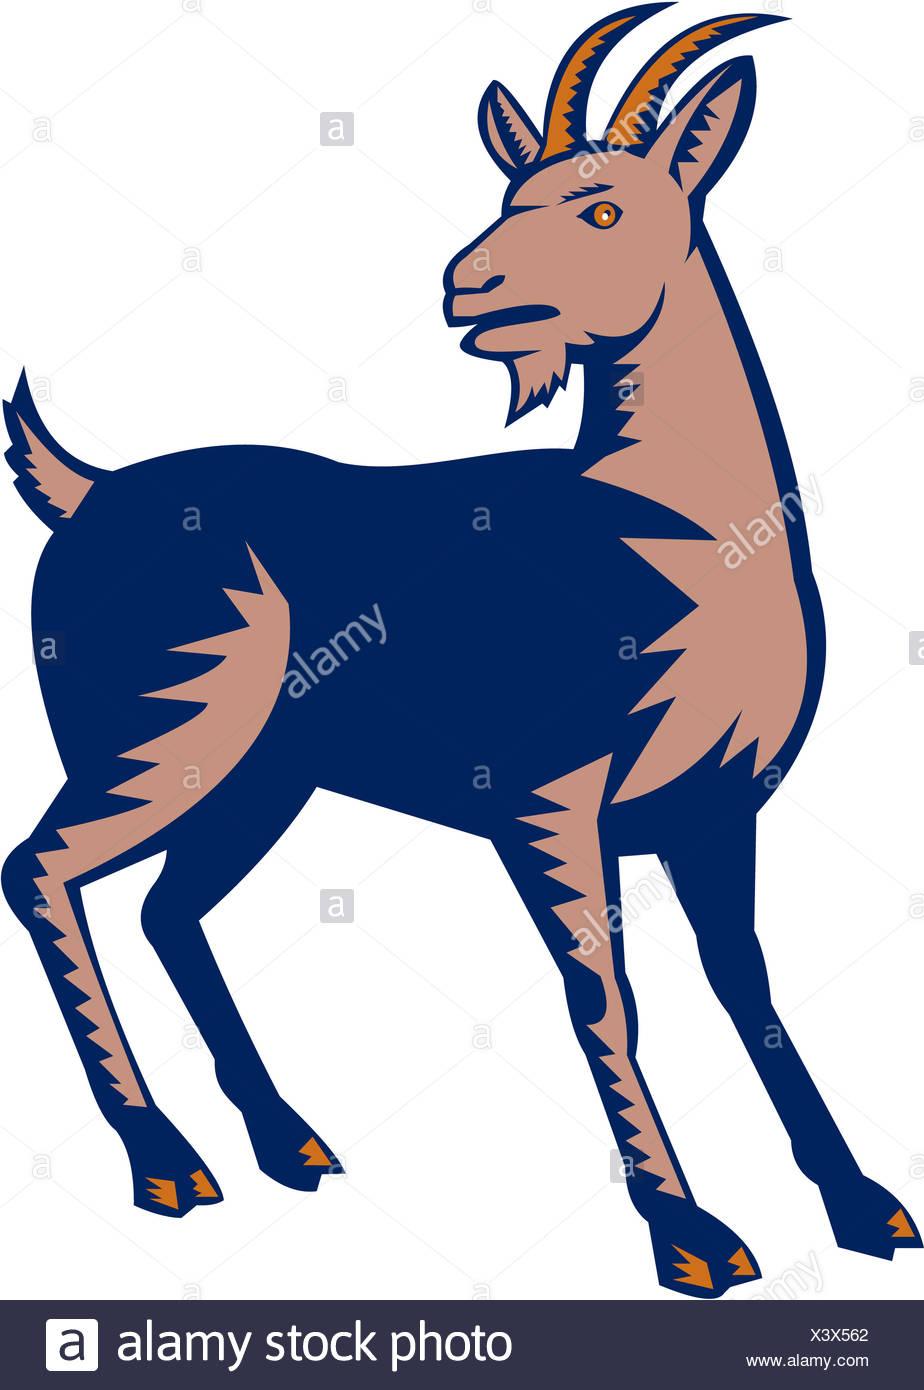 Domestic Goat Woodcut - Stock Image